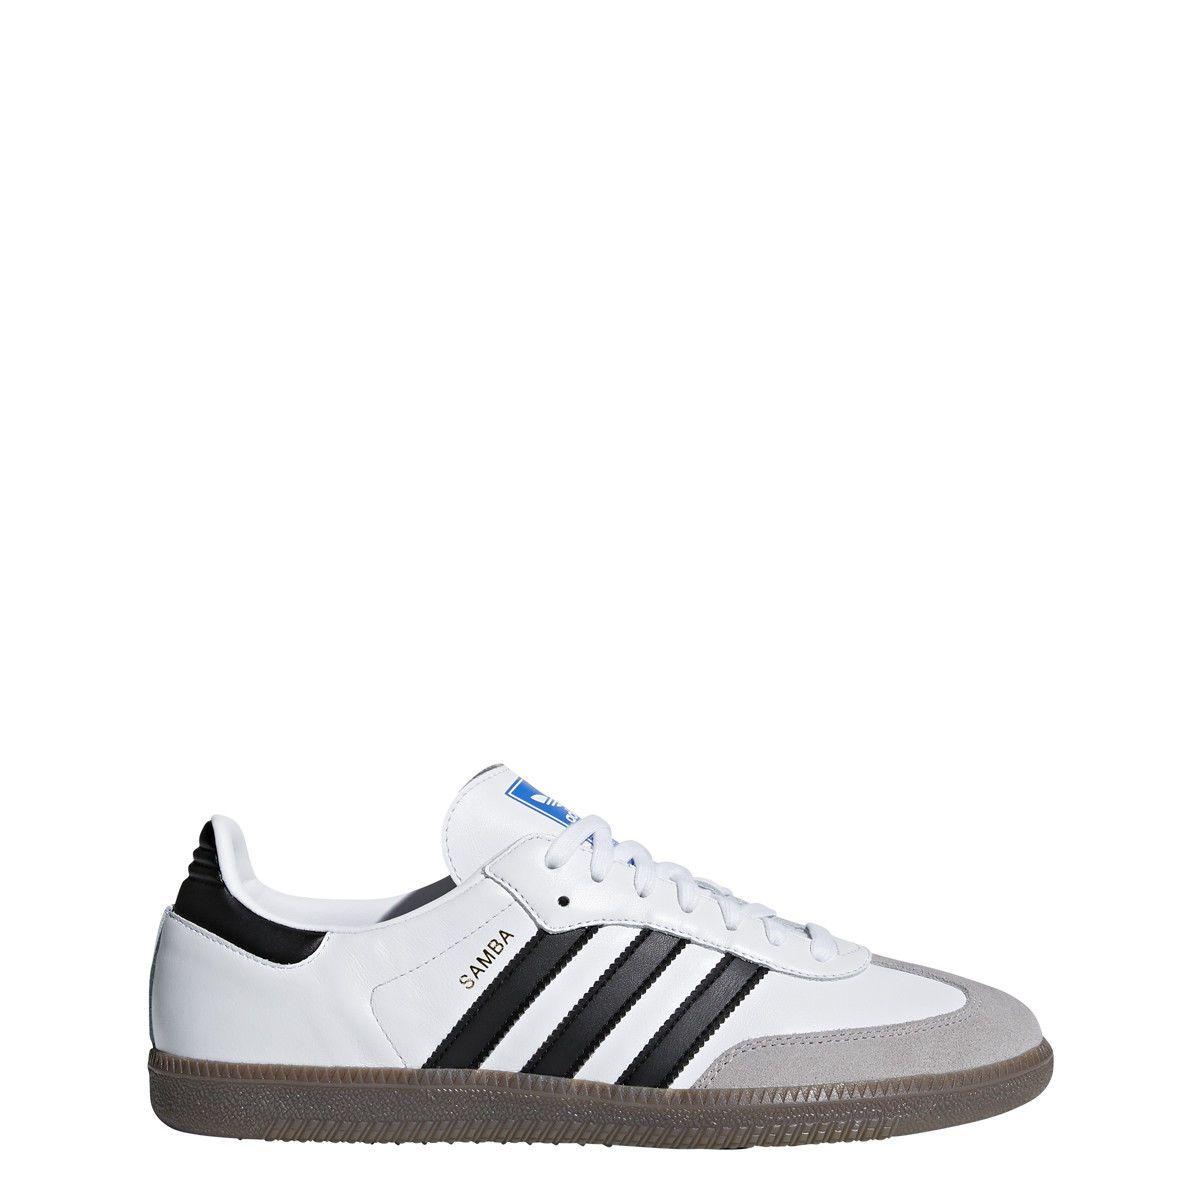 Adidas Samba OG Original Men's Indoor Leather White Soccer